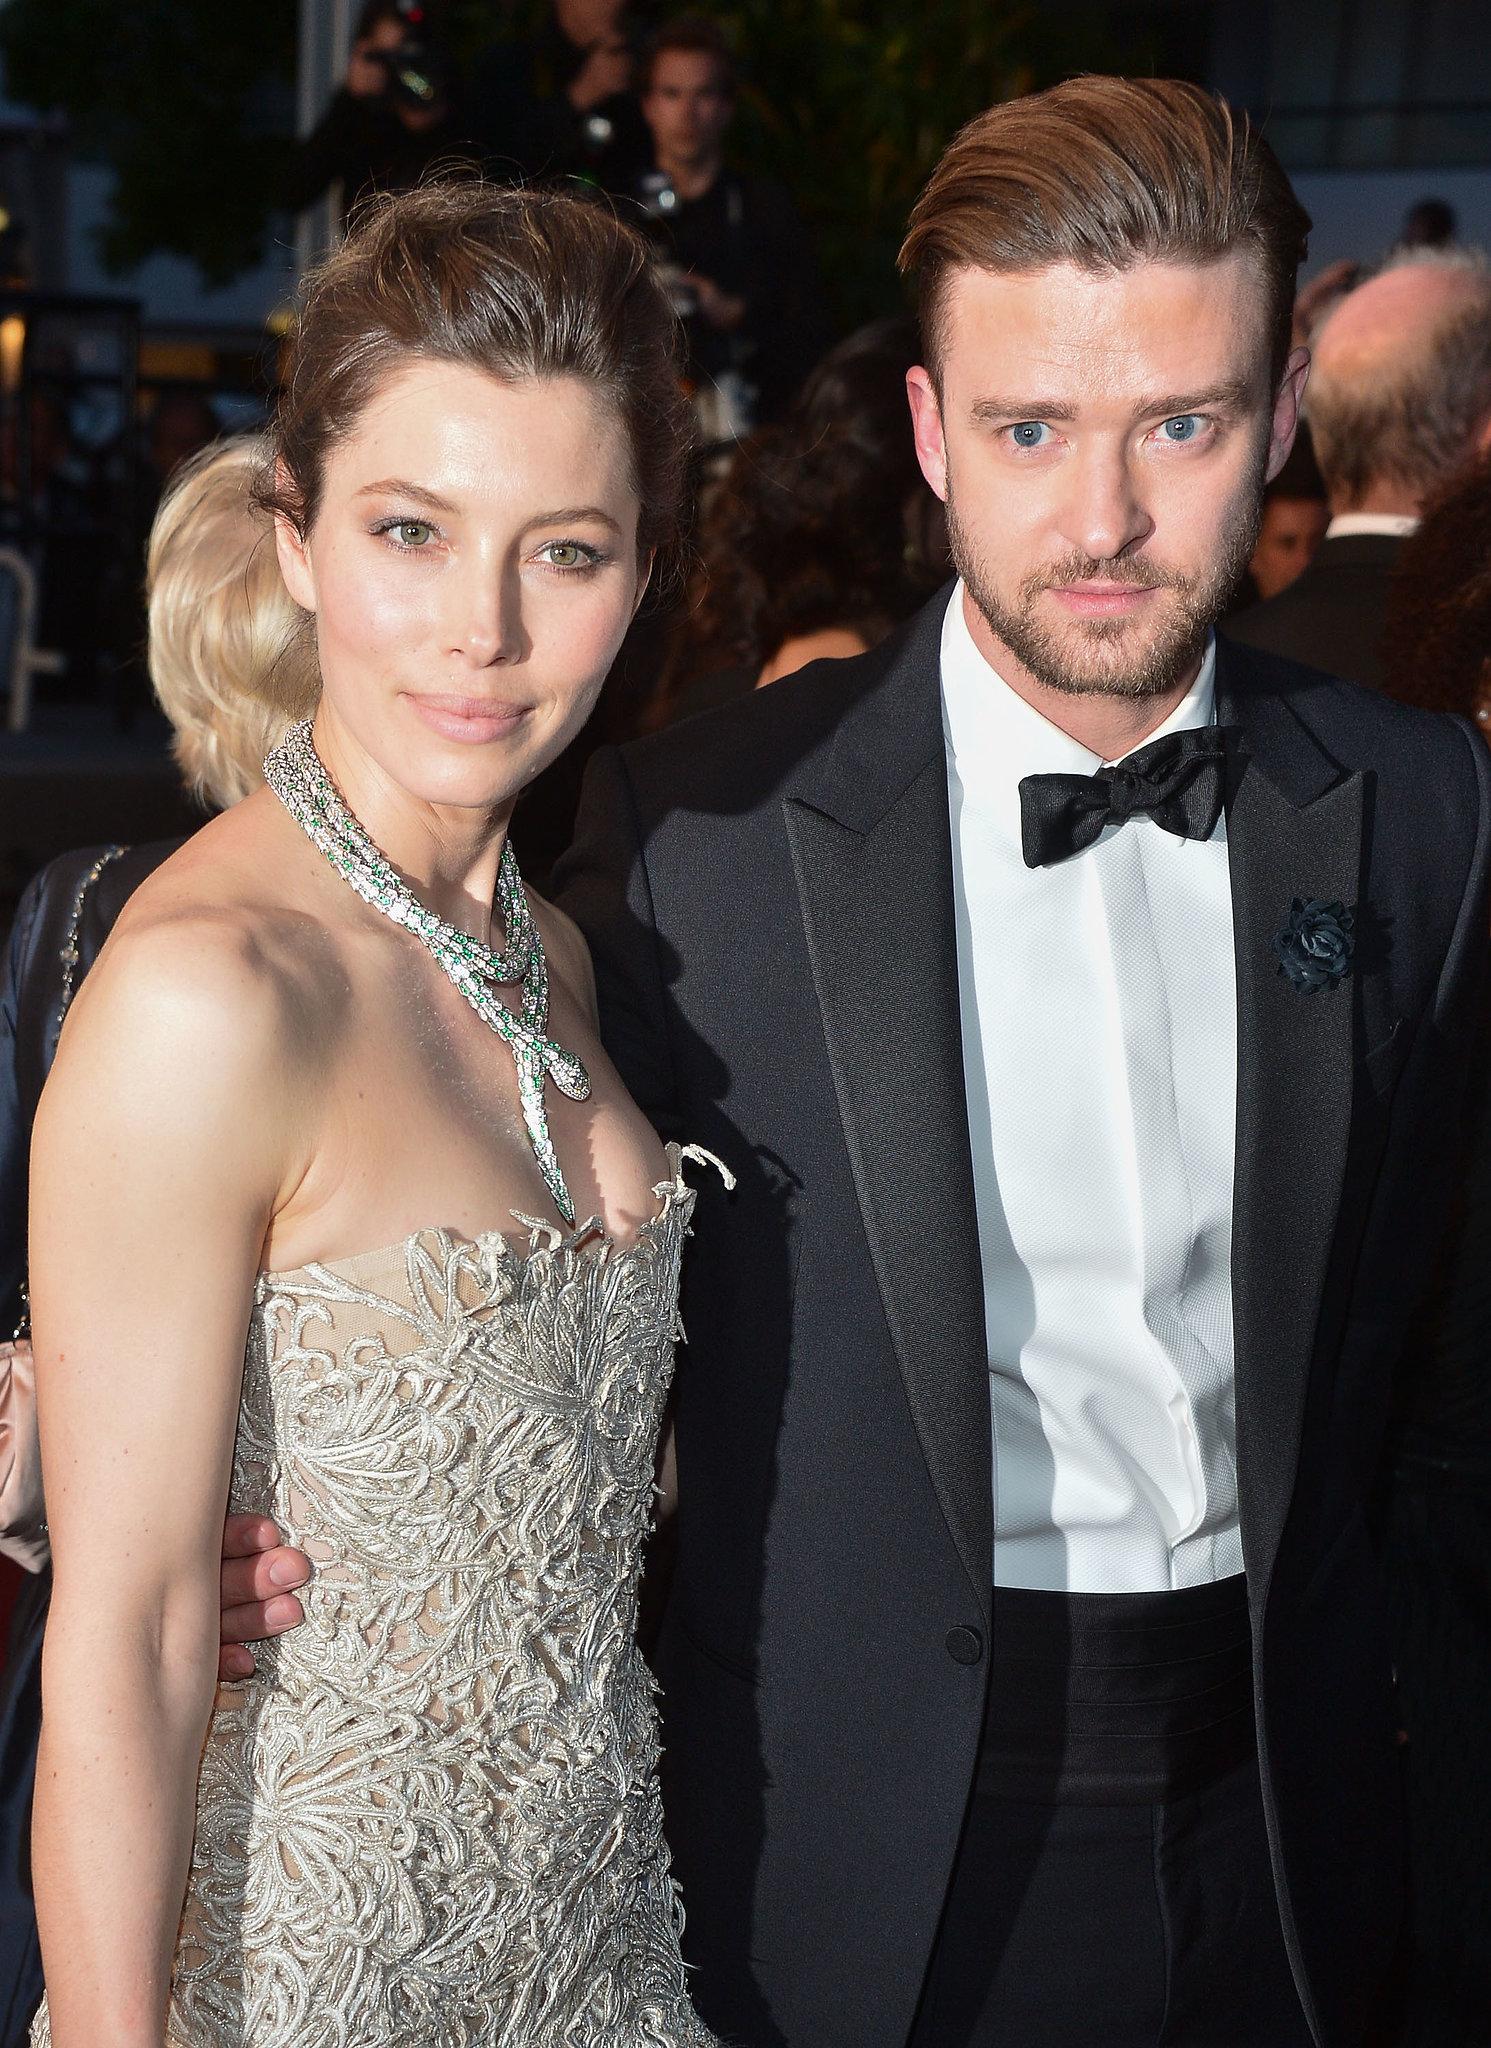 Jessica Biel and Justin Timberlake in 2013